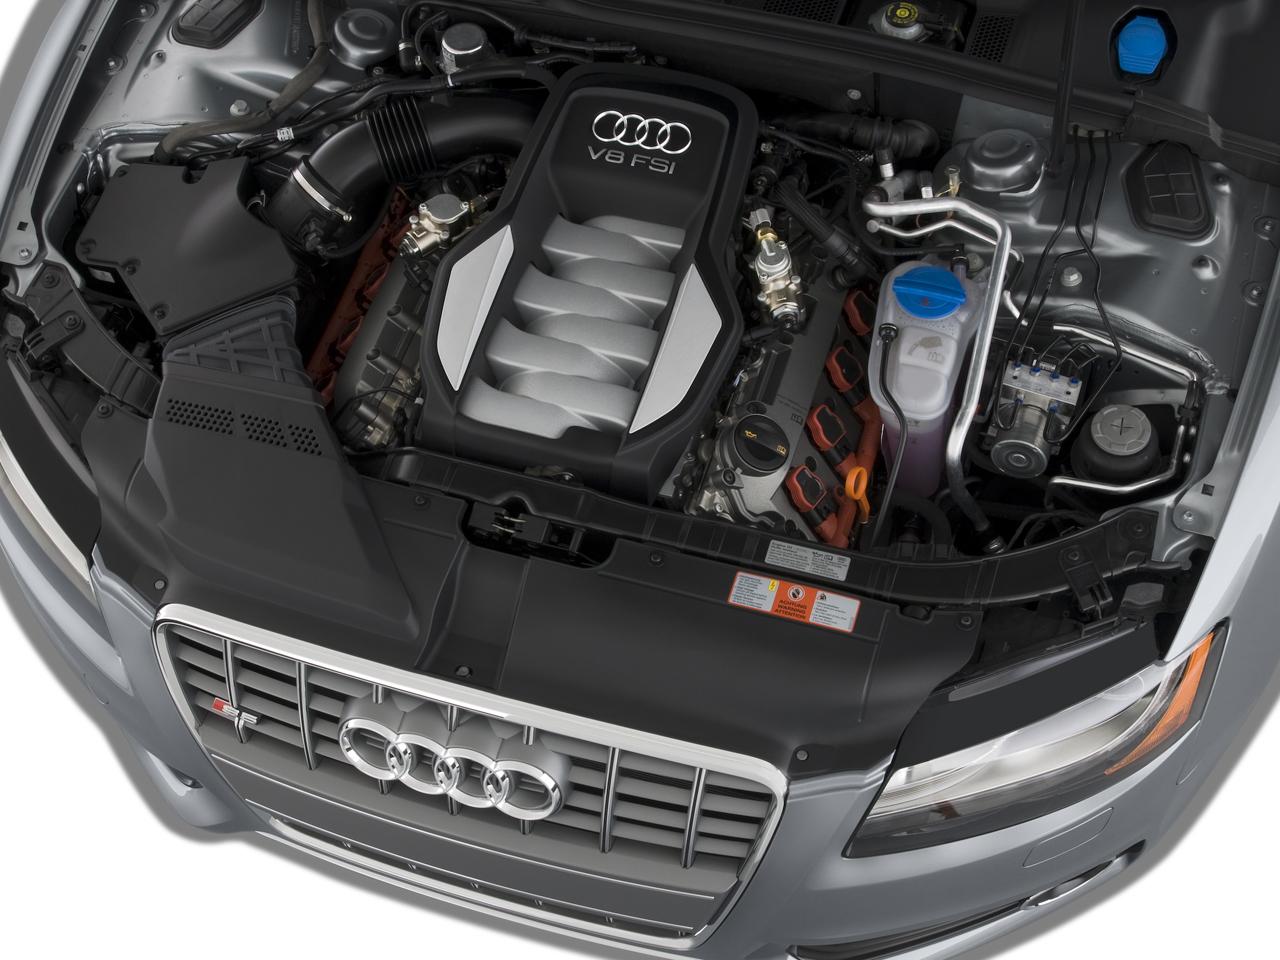 2009 Audi S5 - Audi Luxury Coupe Review - Automobile Magazine